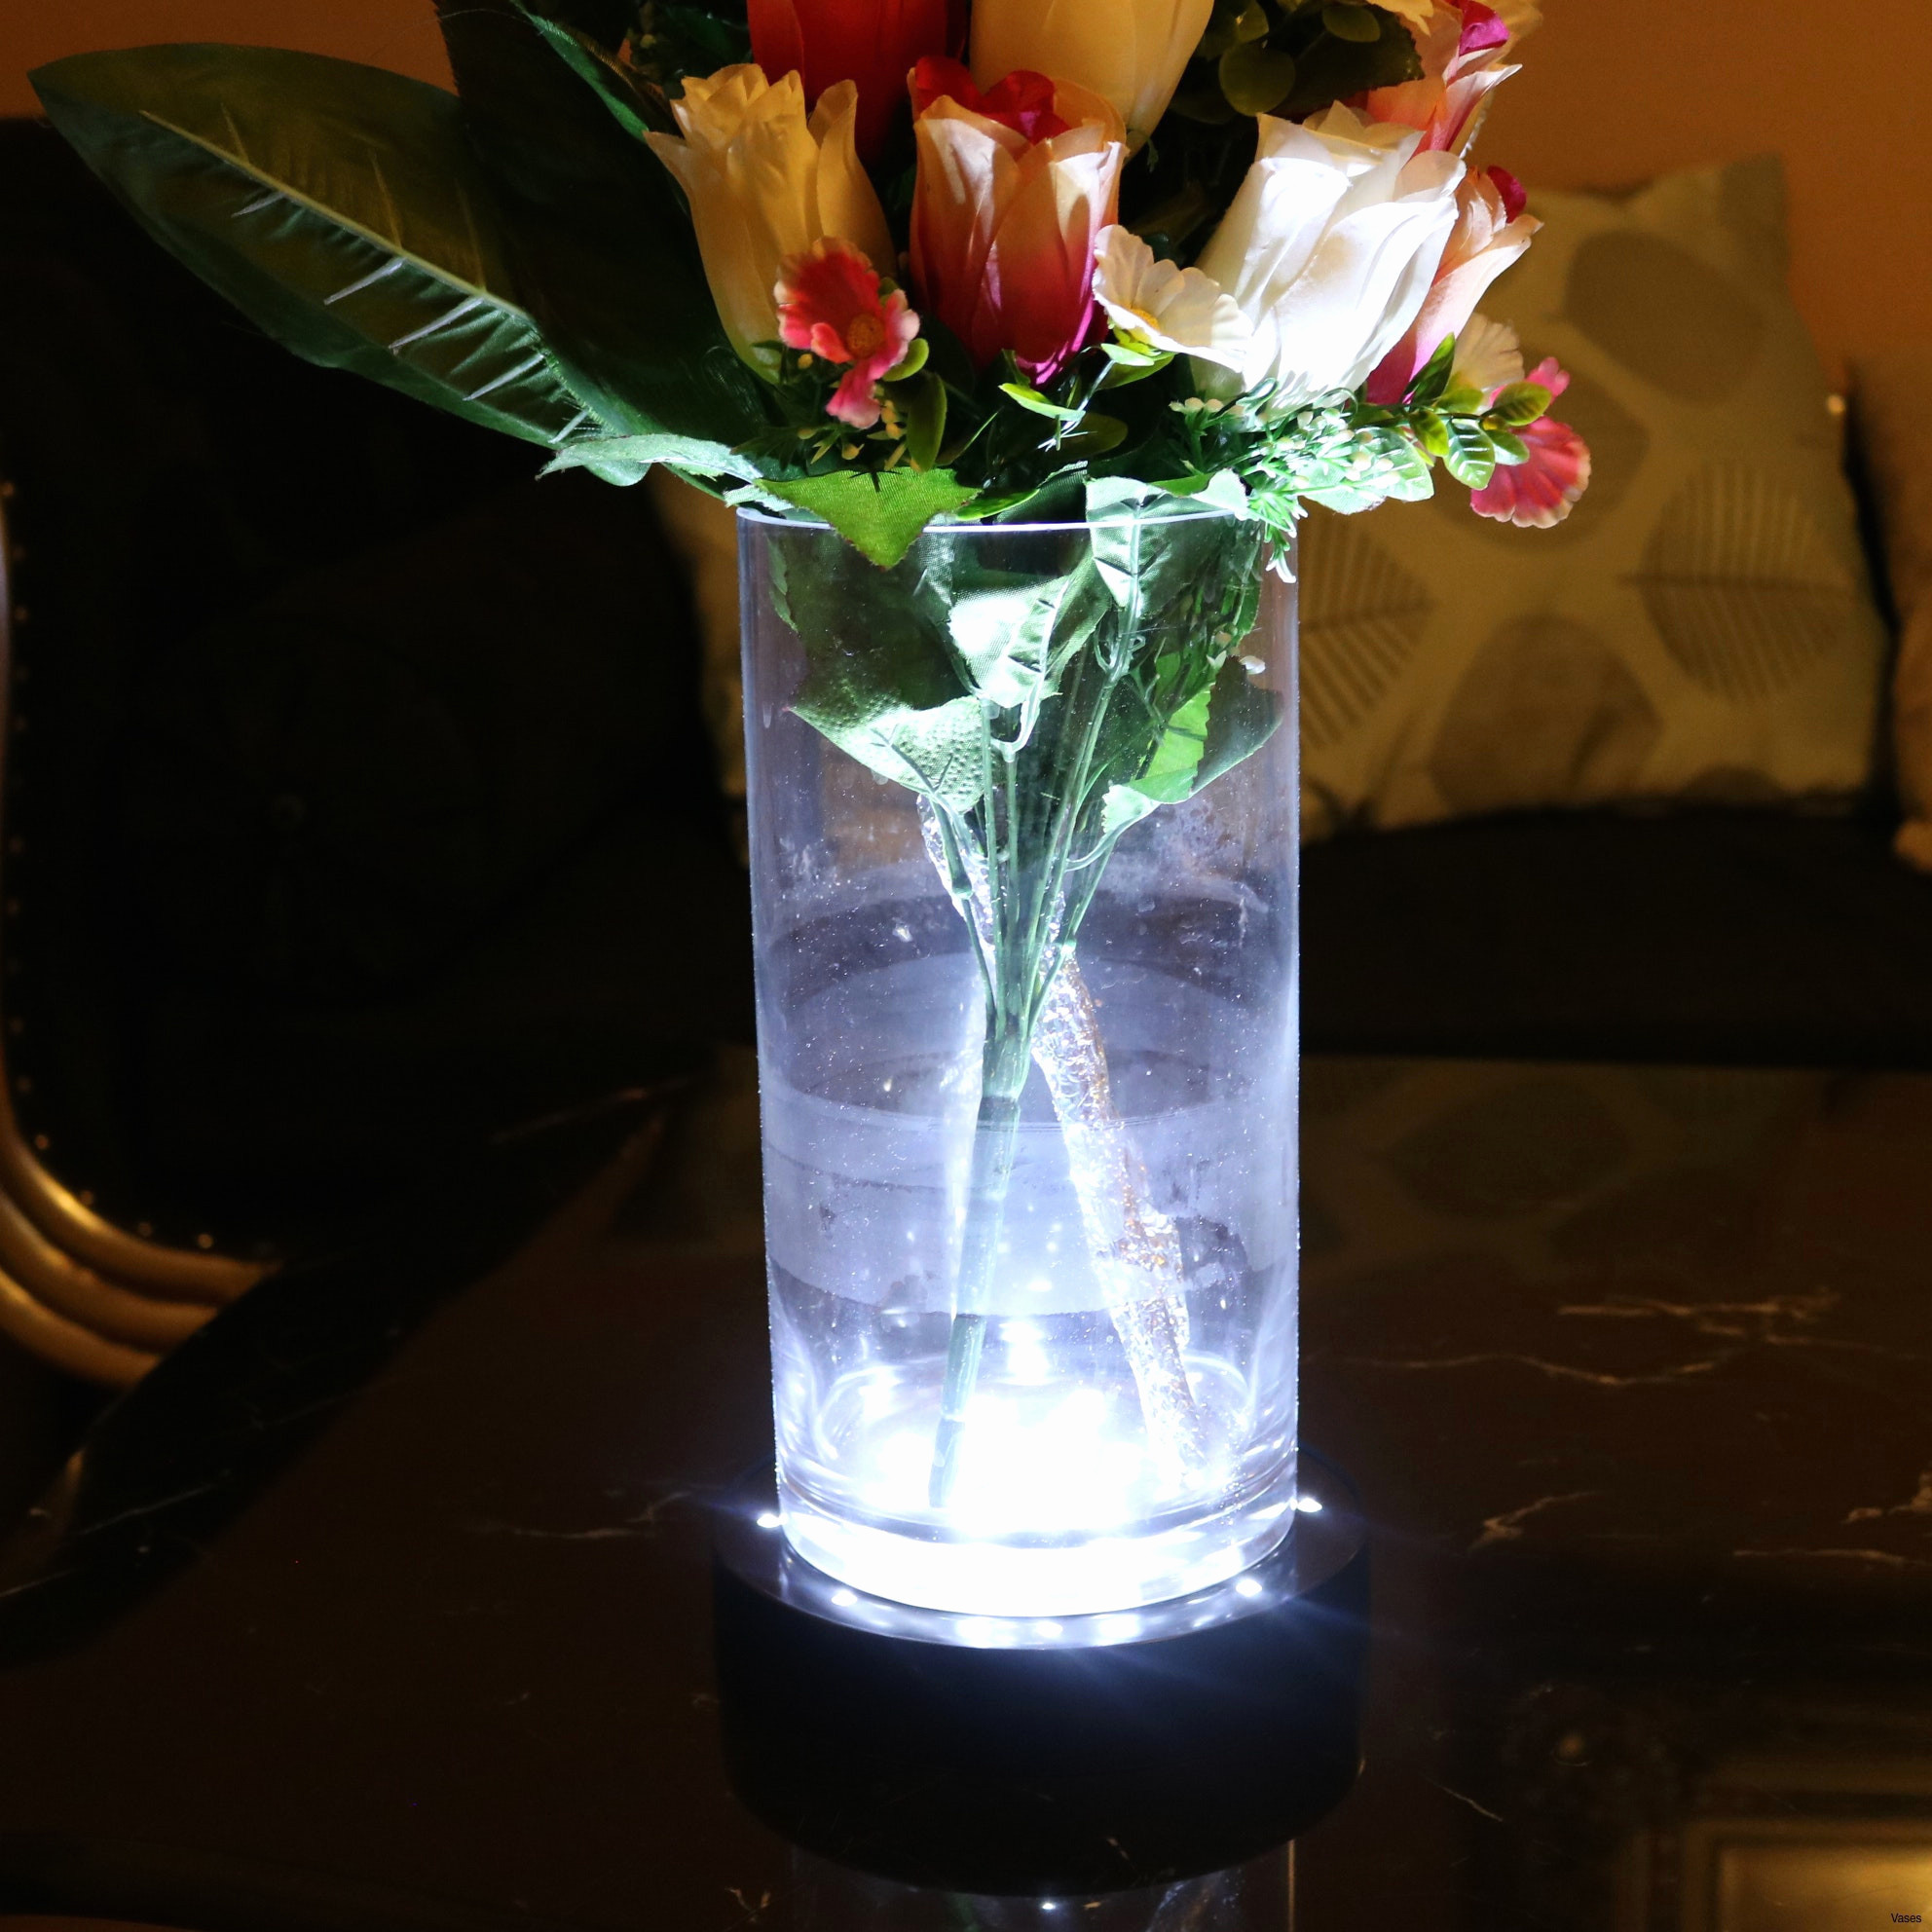 square vase floral arrangement of best flowers for wedding lovely mirrored square vase 3h vases mirror pertaining to best flowers for wedding luxury 7 elegant wedding bouquet holder for silk flowers pics